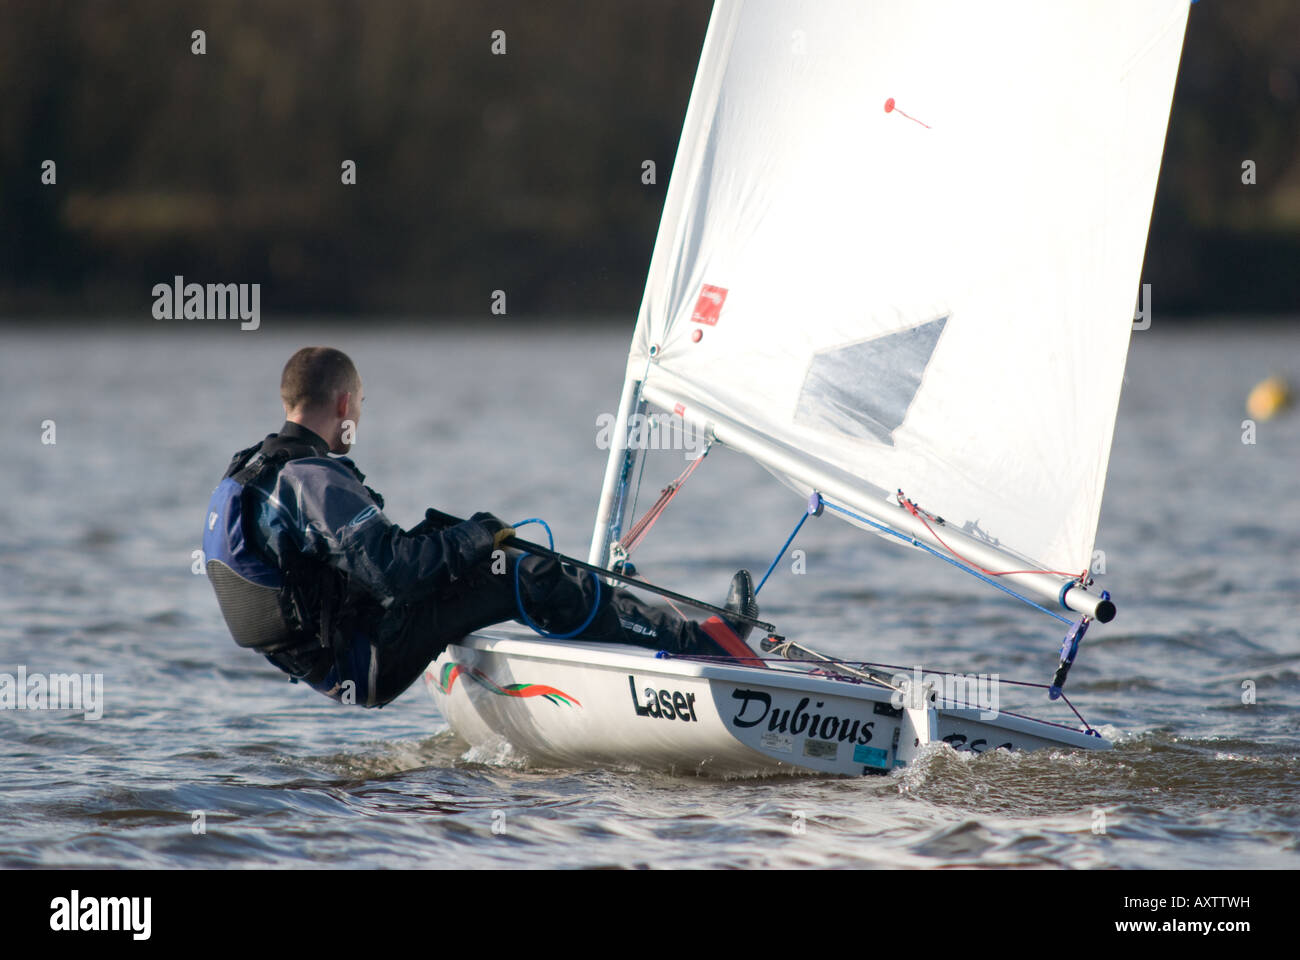 Yachtsman in full sail - Stock Image